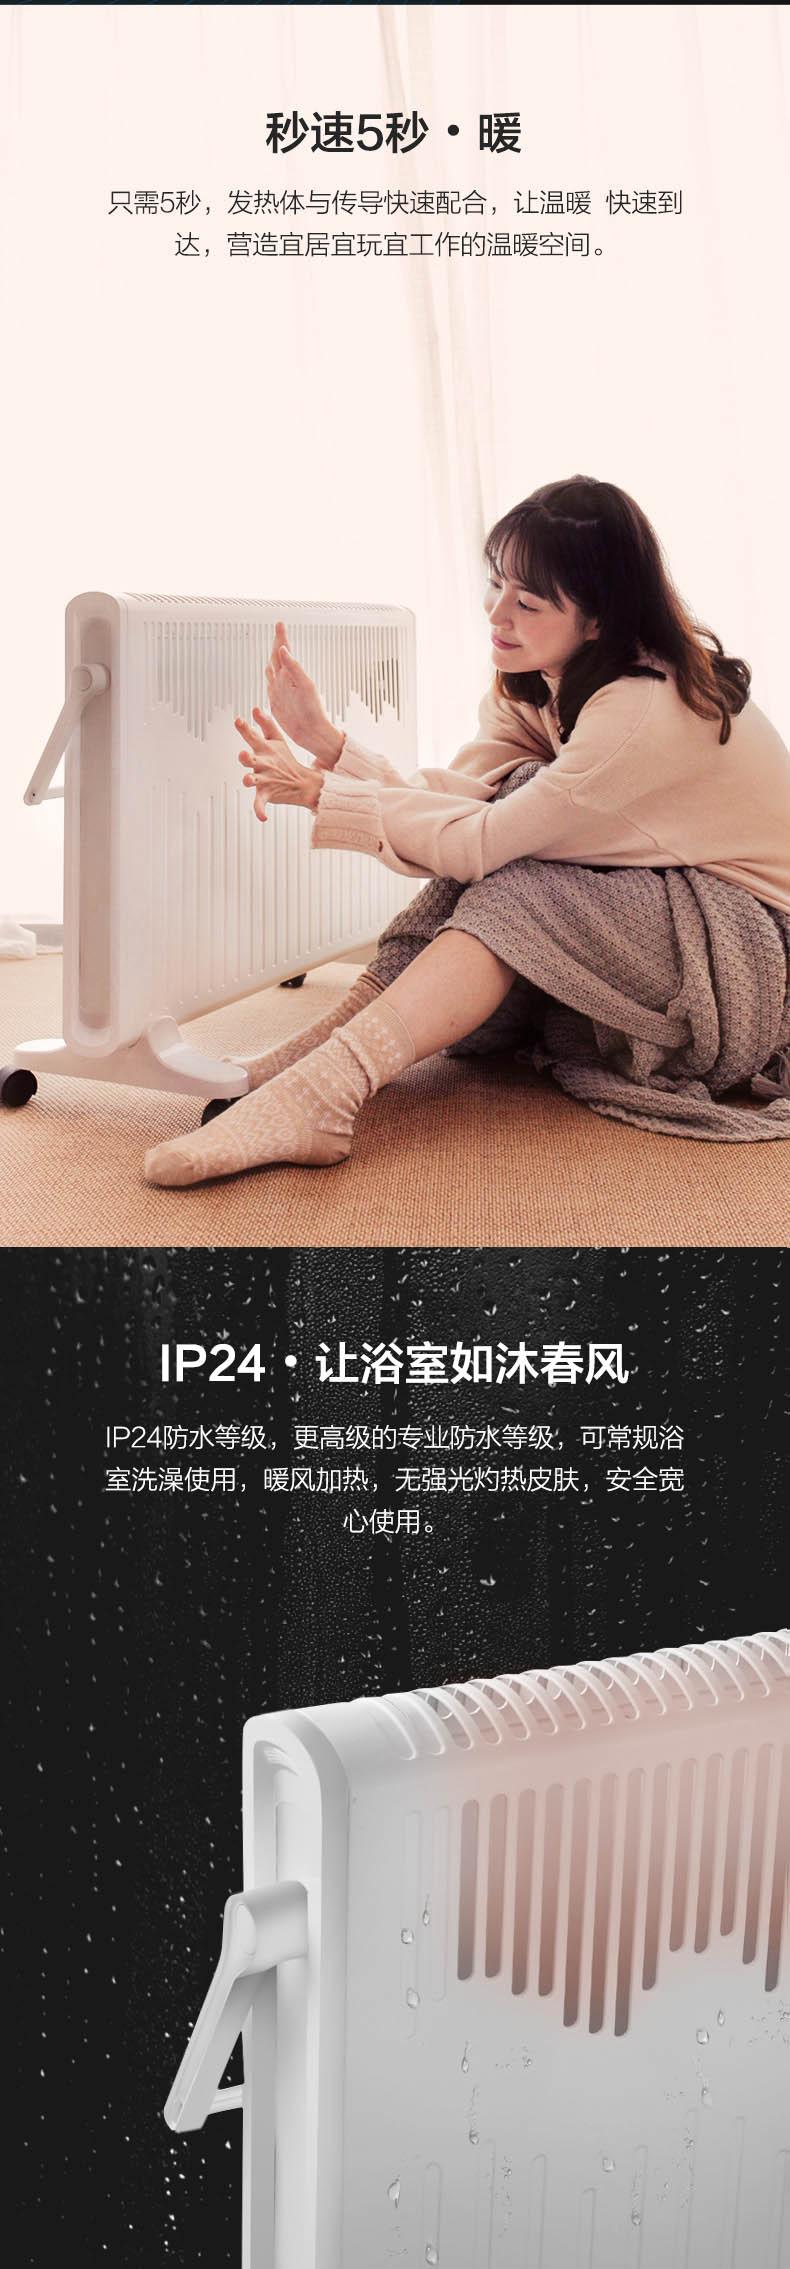 HC22169-W详情页_04.jpg